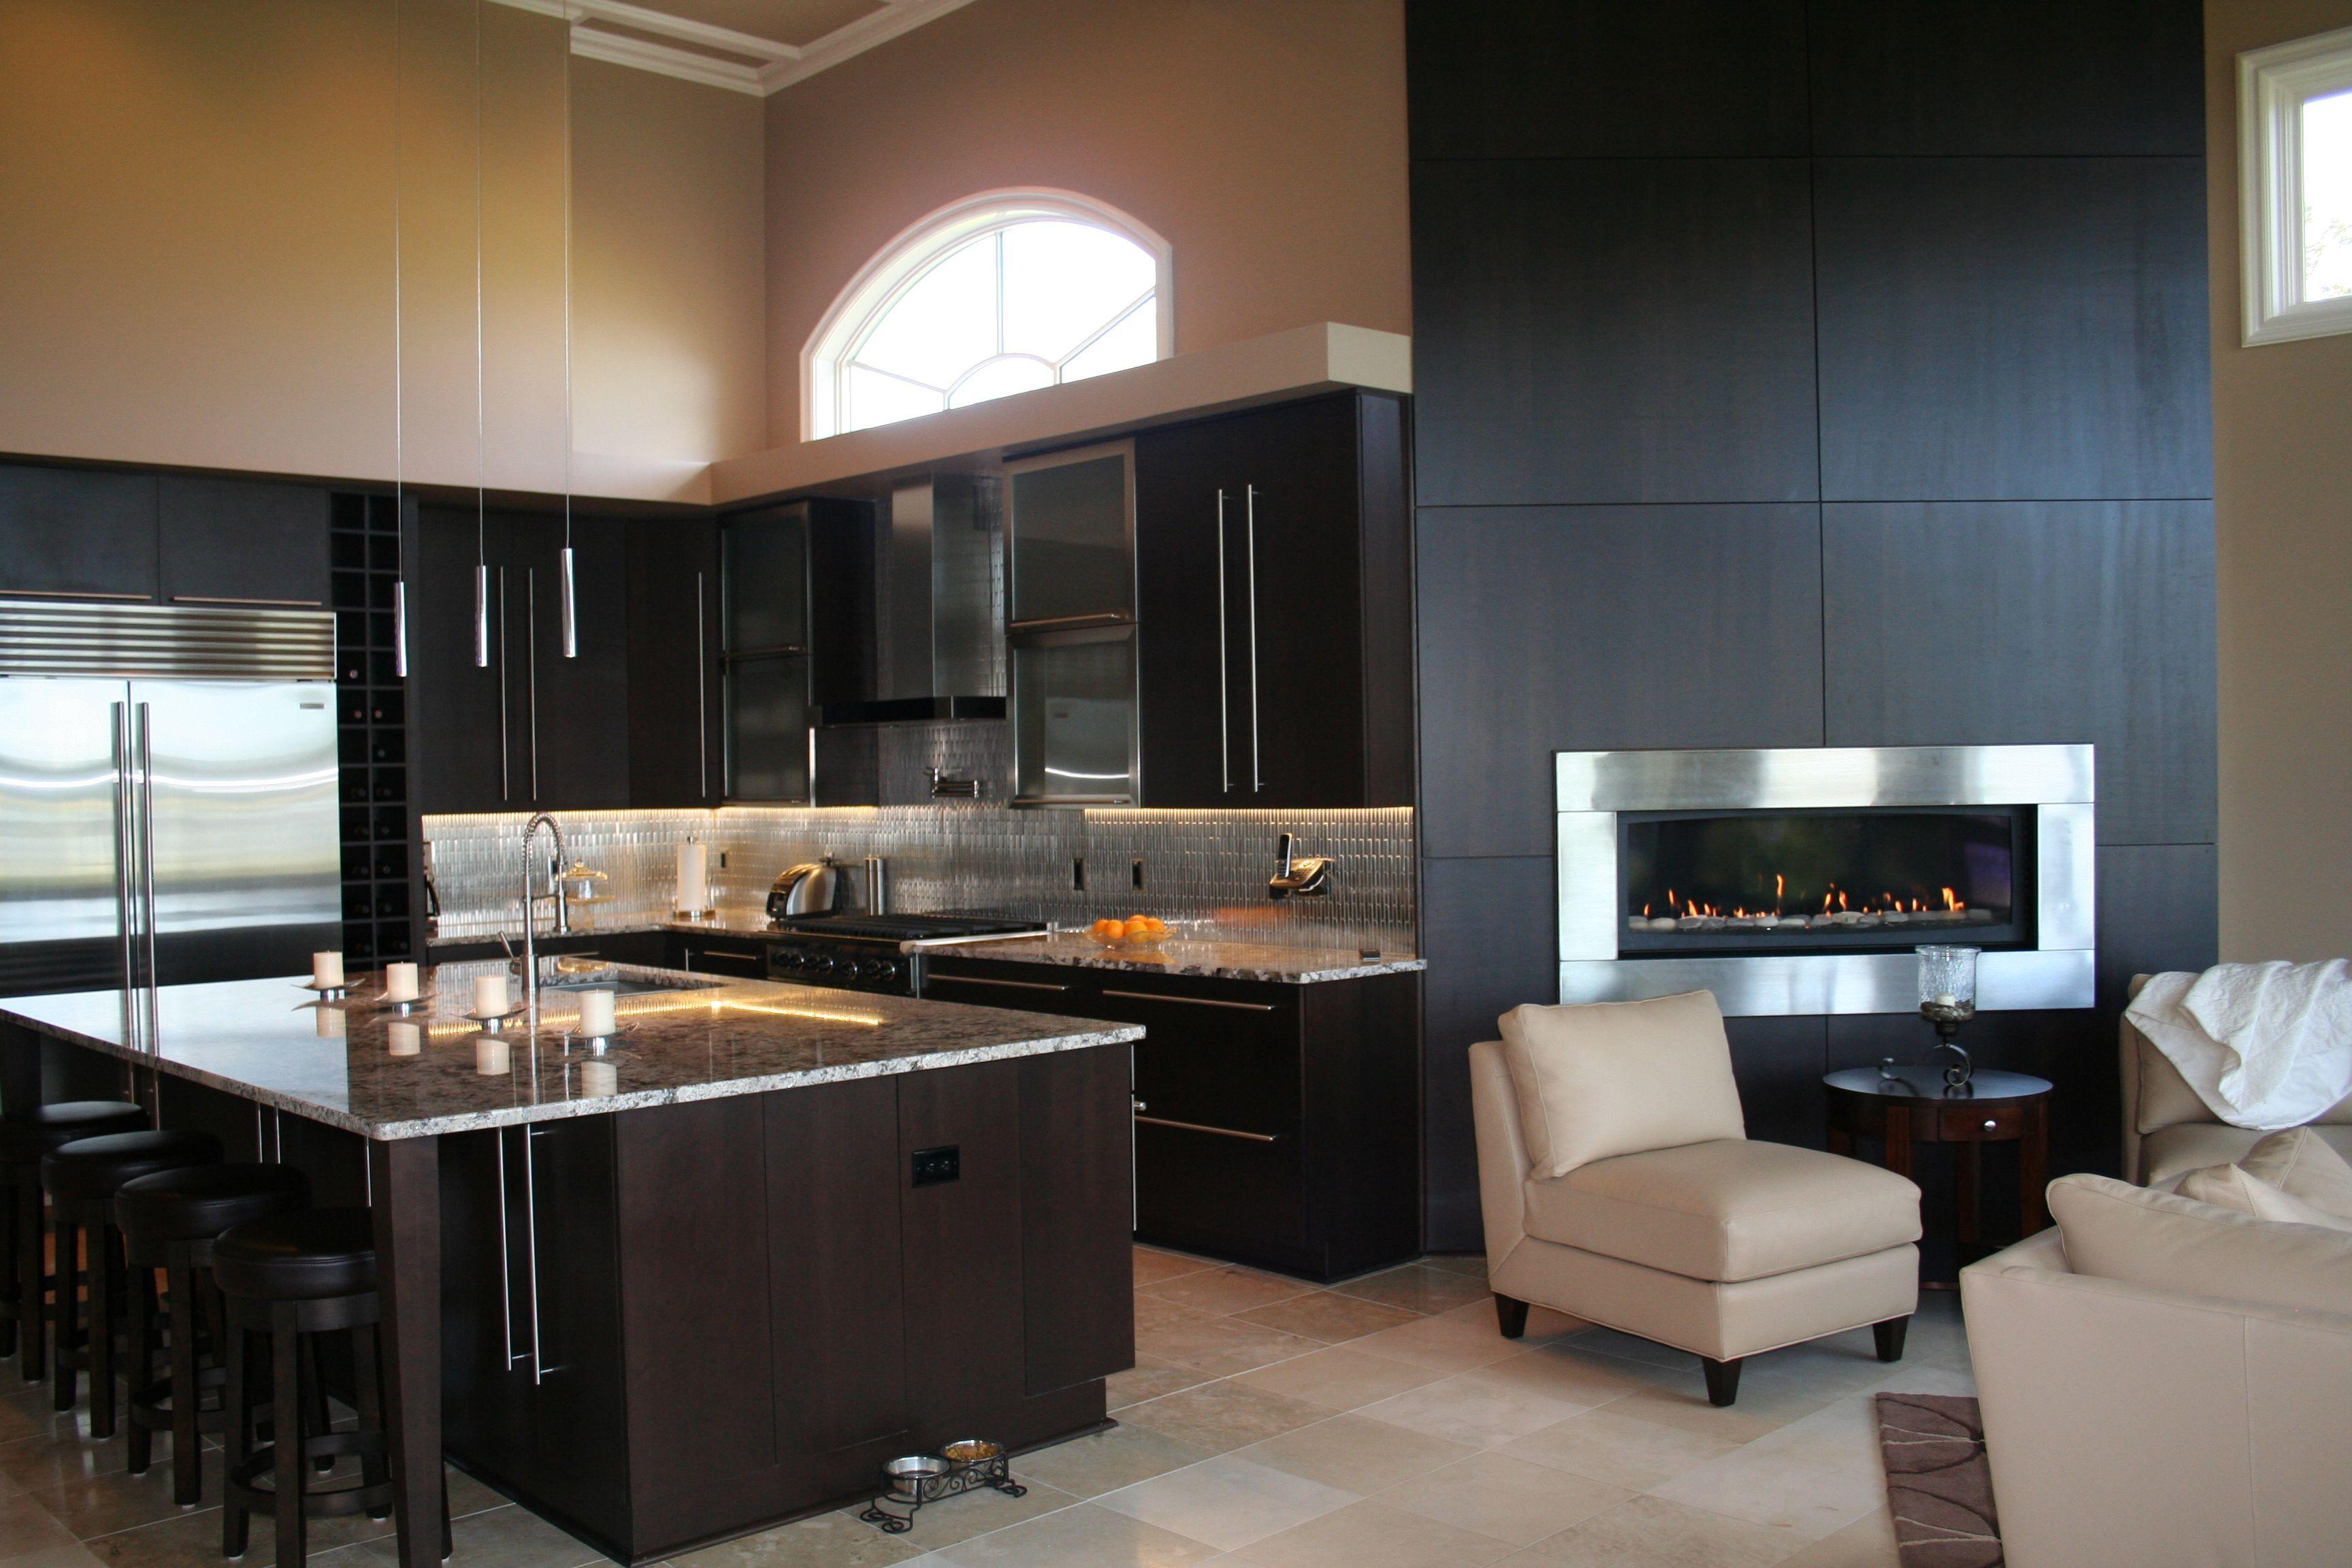 Kitchen designs islands contemporary espresso kitchen cabinets